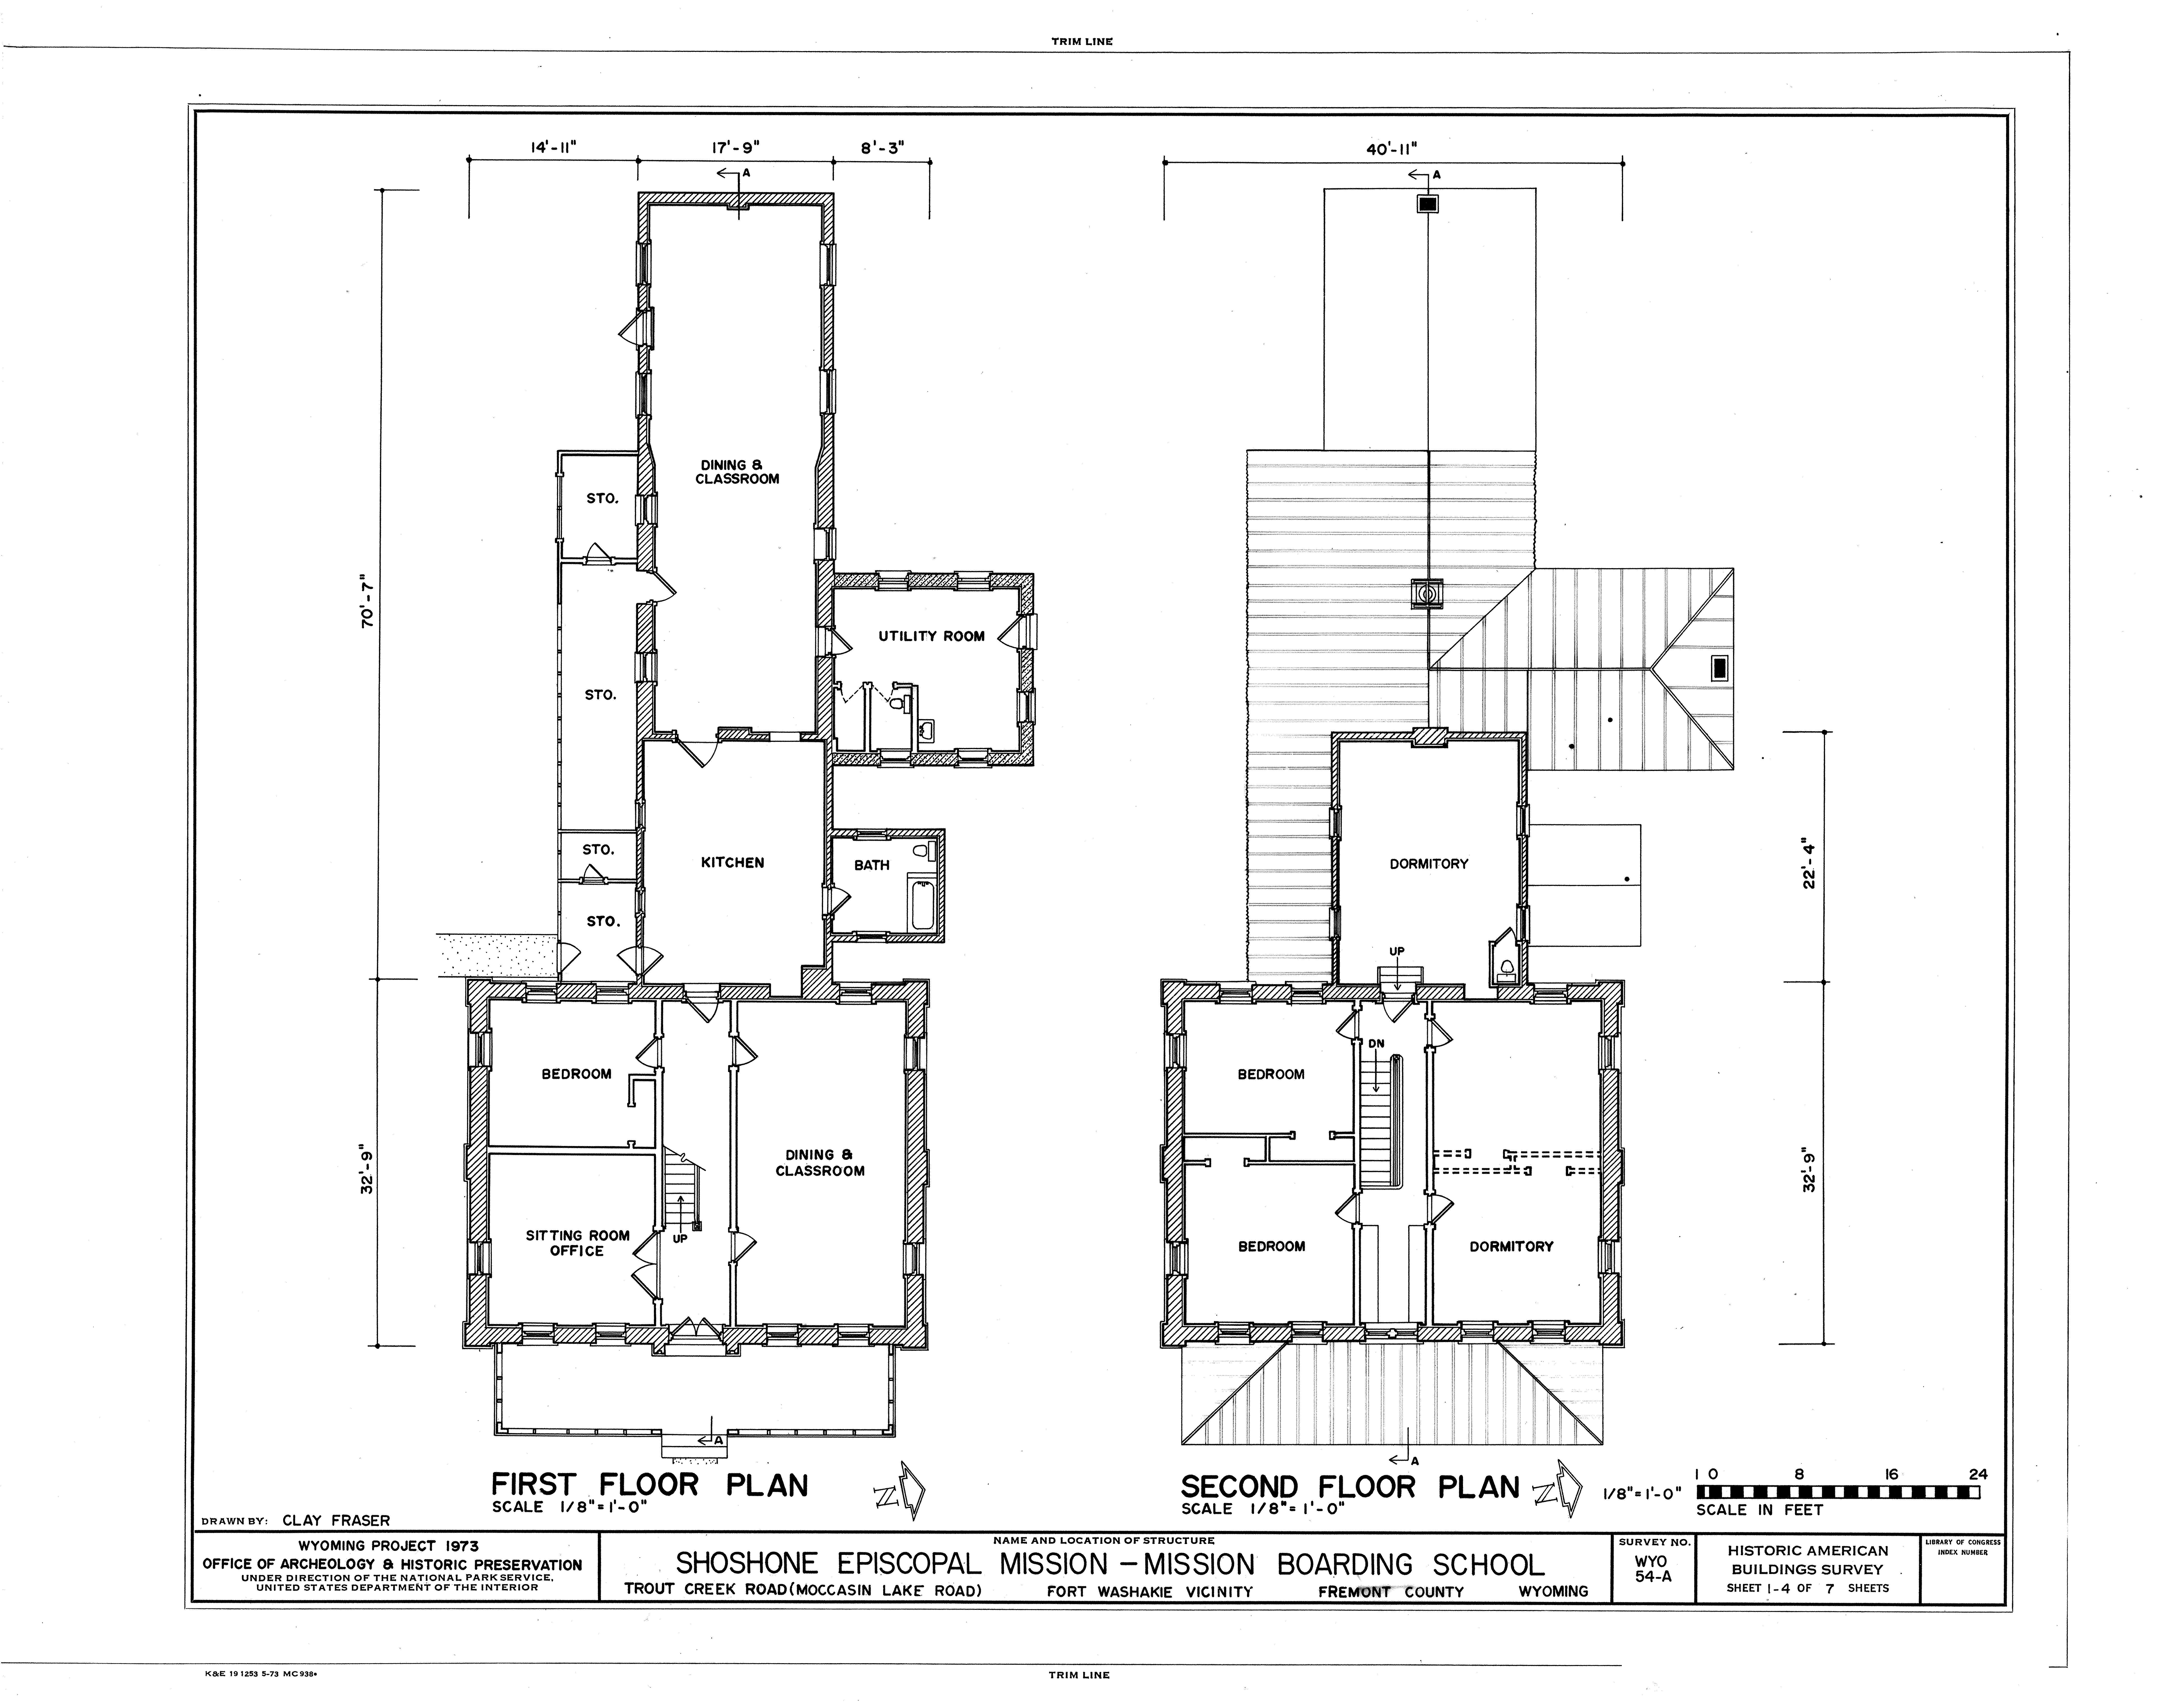 2 Bedroom Floor Plan File First And Second Floor Plan Shoshone Episcopal